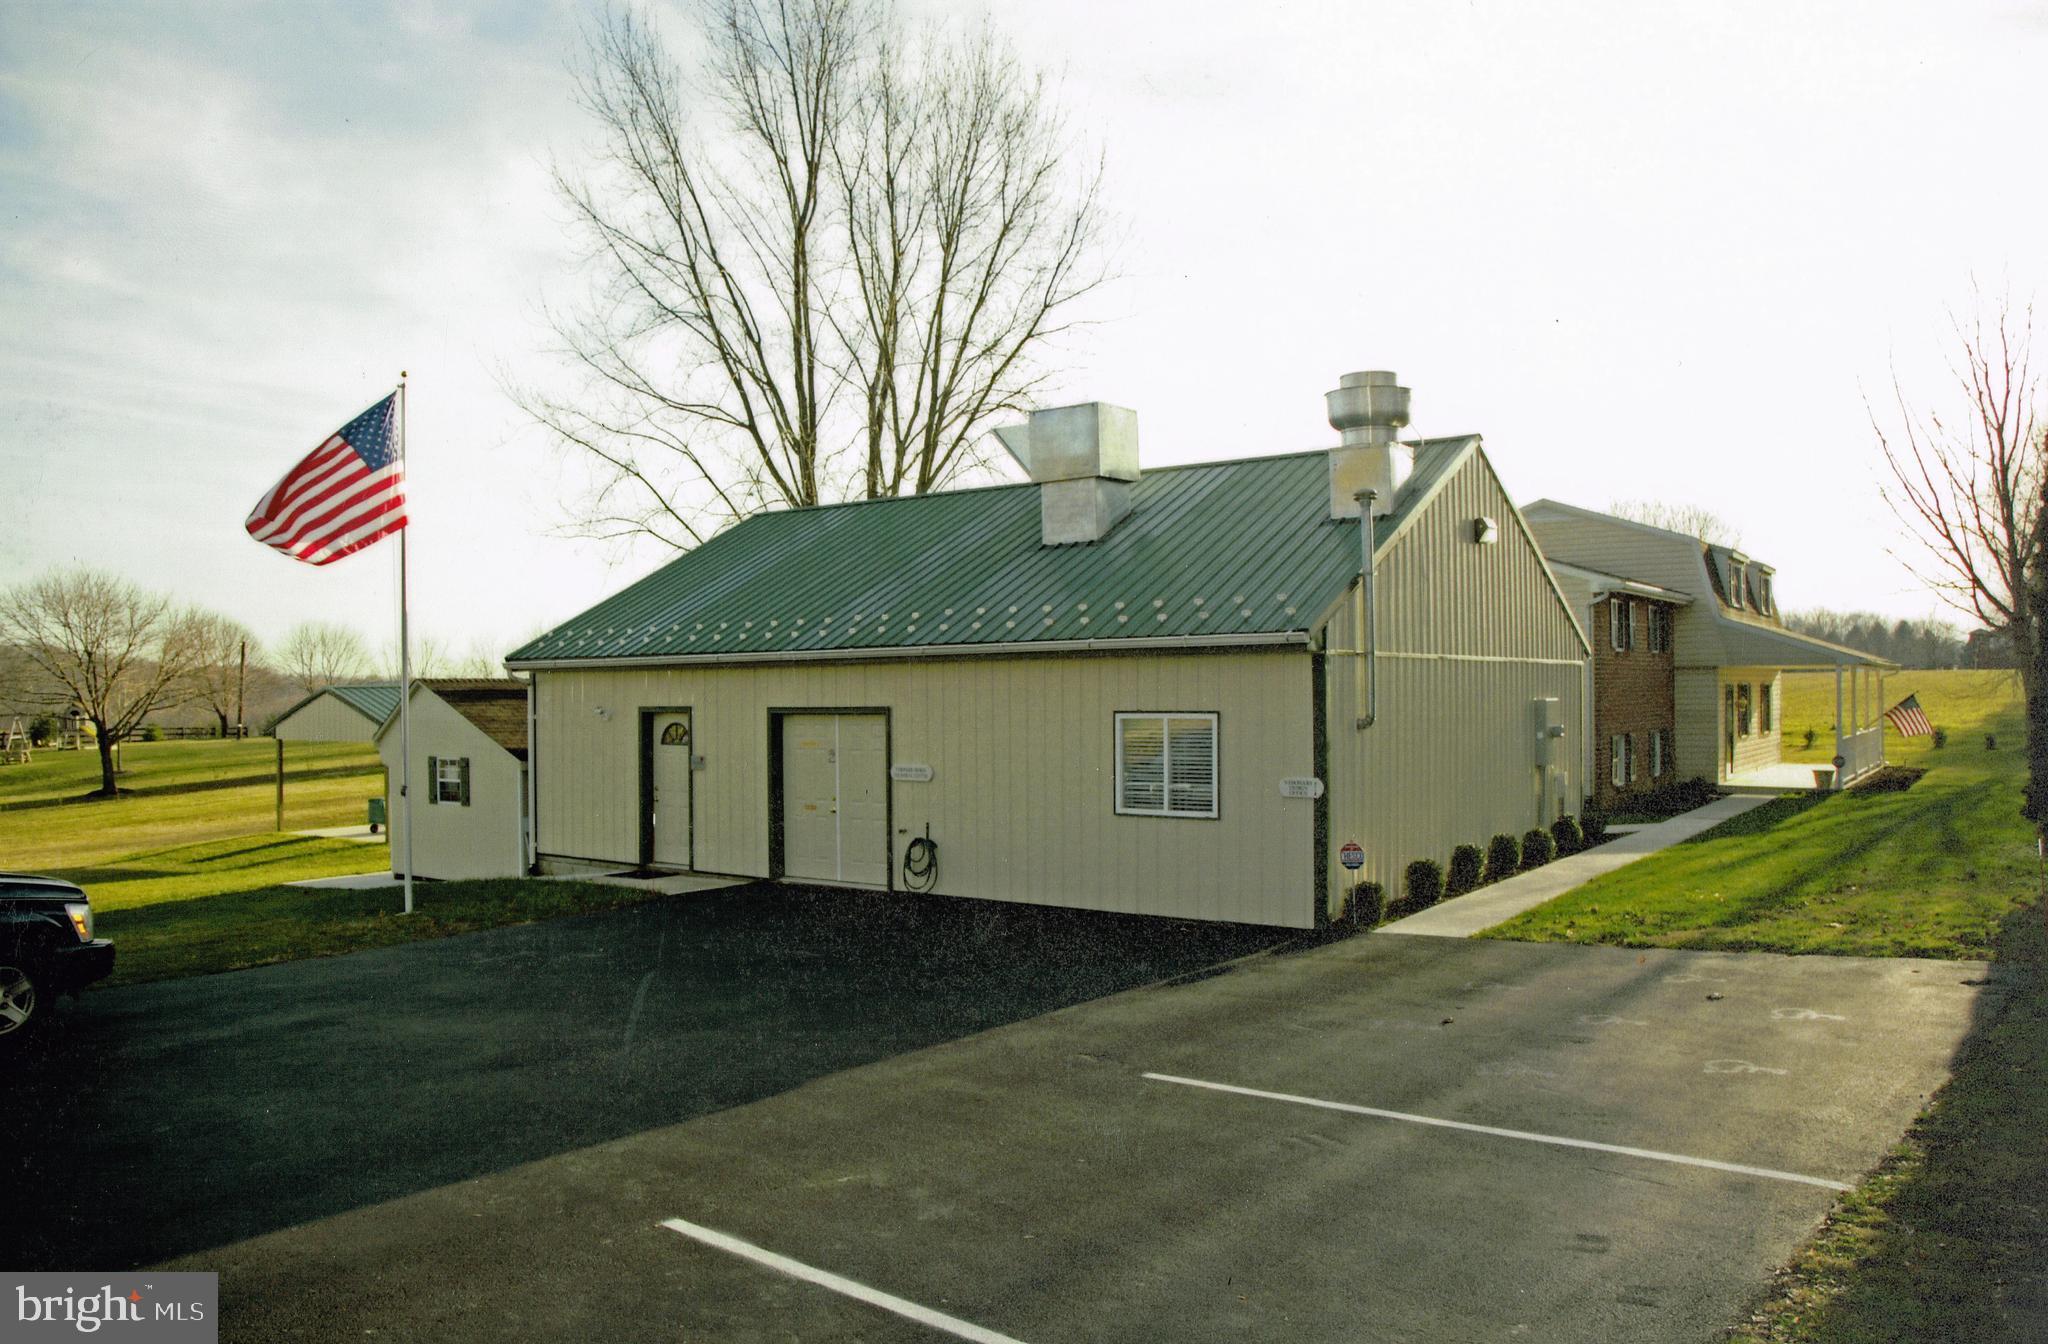 4917 Homeville Rd, Cochranville, PA, 19330